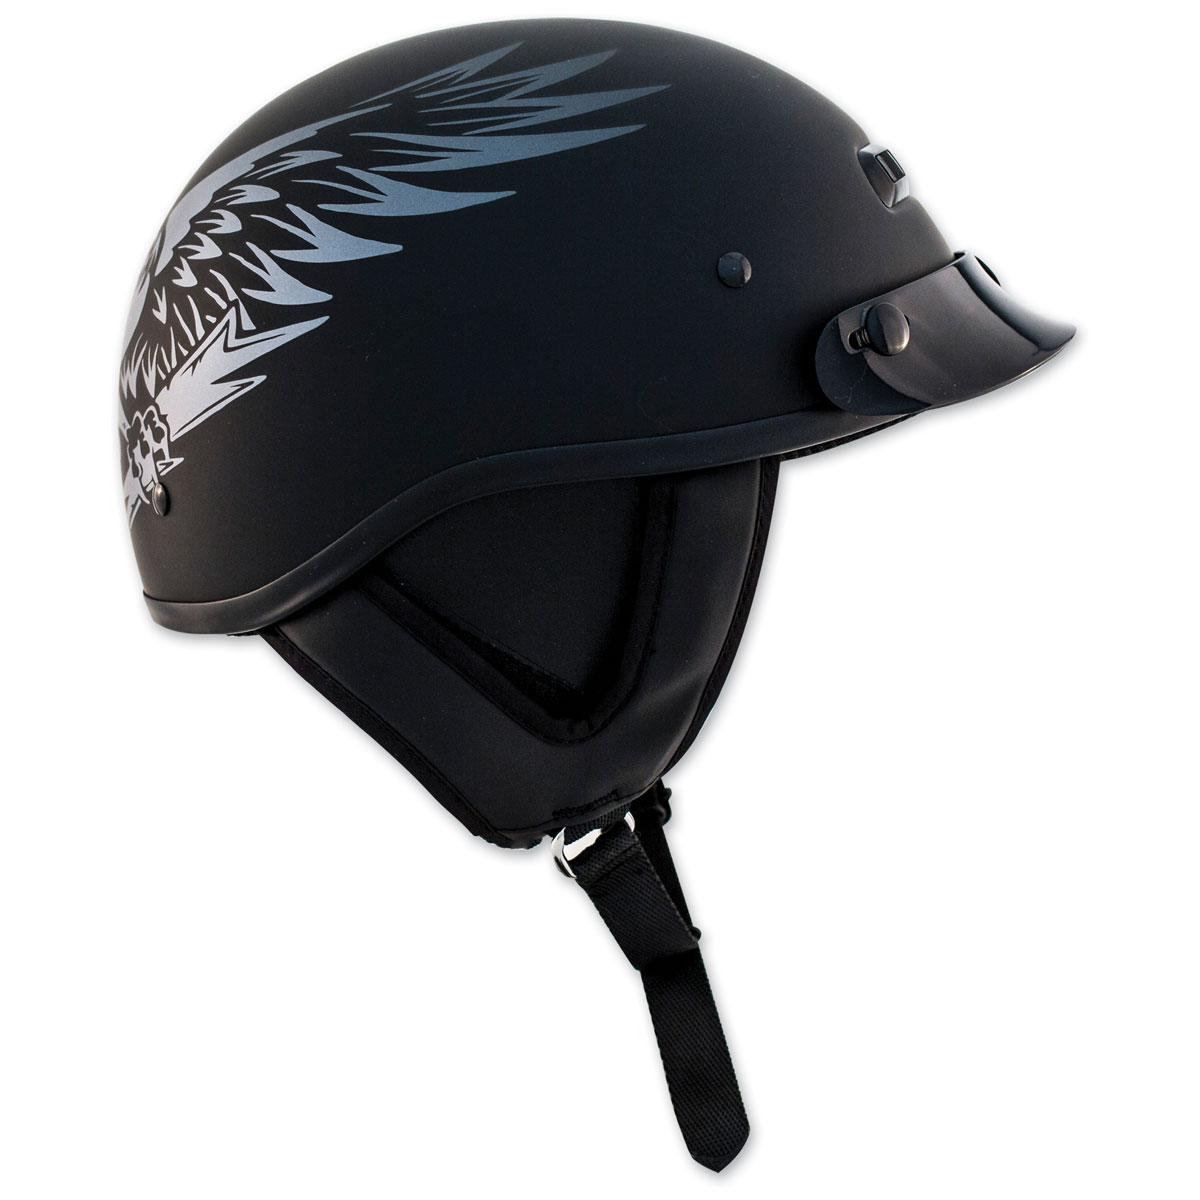 Amazon.com: Zox Helmets